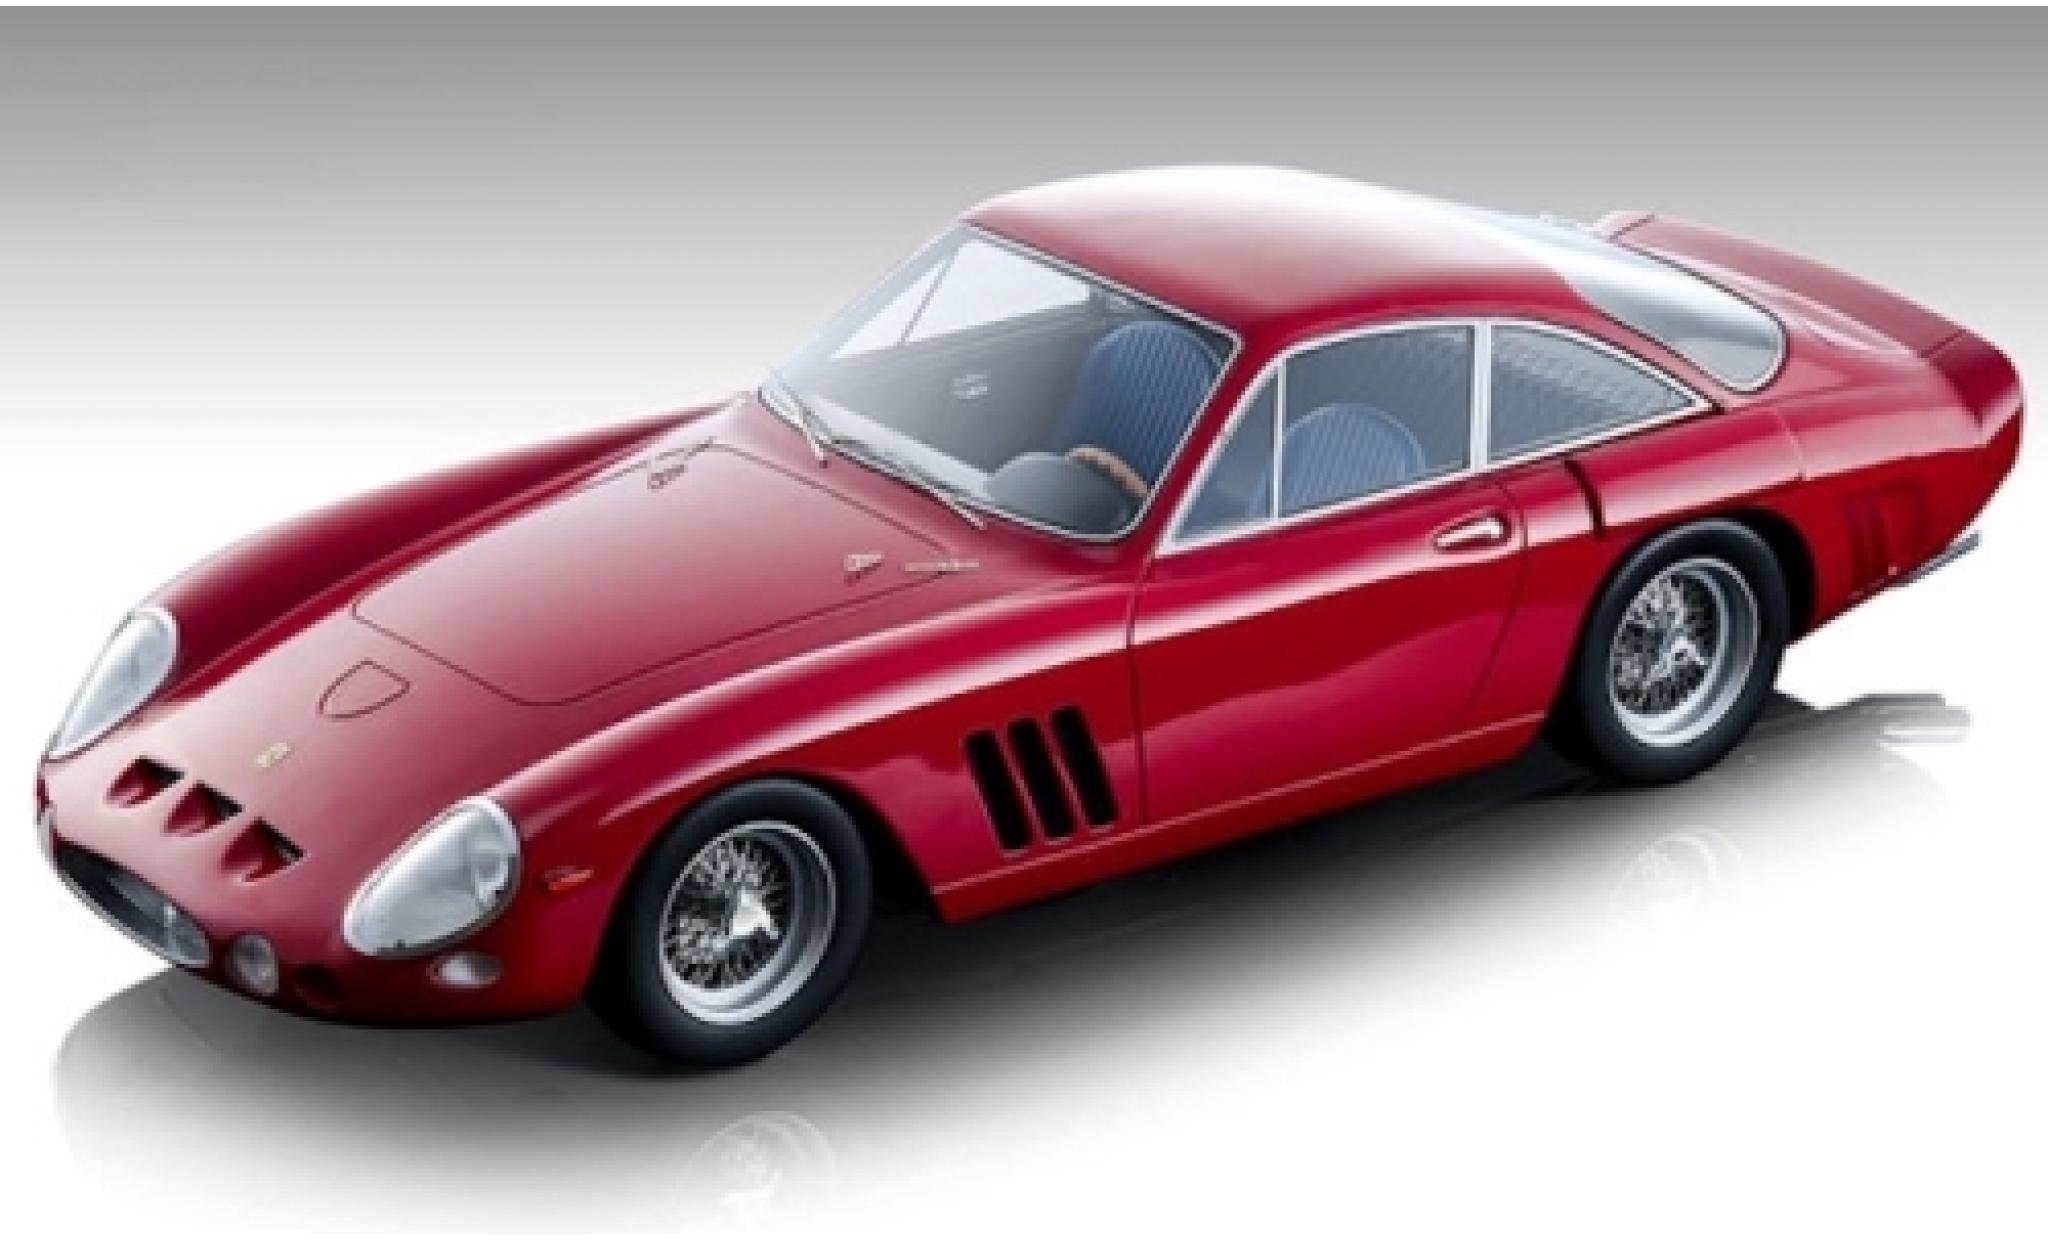 Ferrari 330 1/18 Tecnomodel LMB rouge 1962 Pressefahrzeug